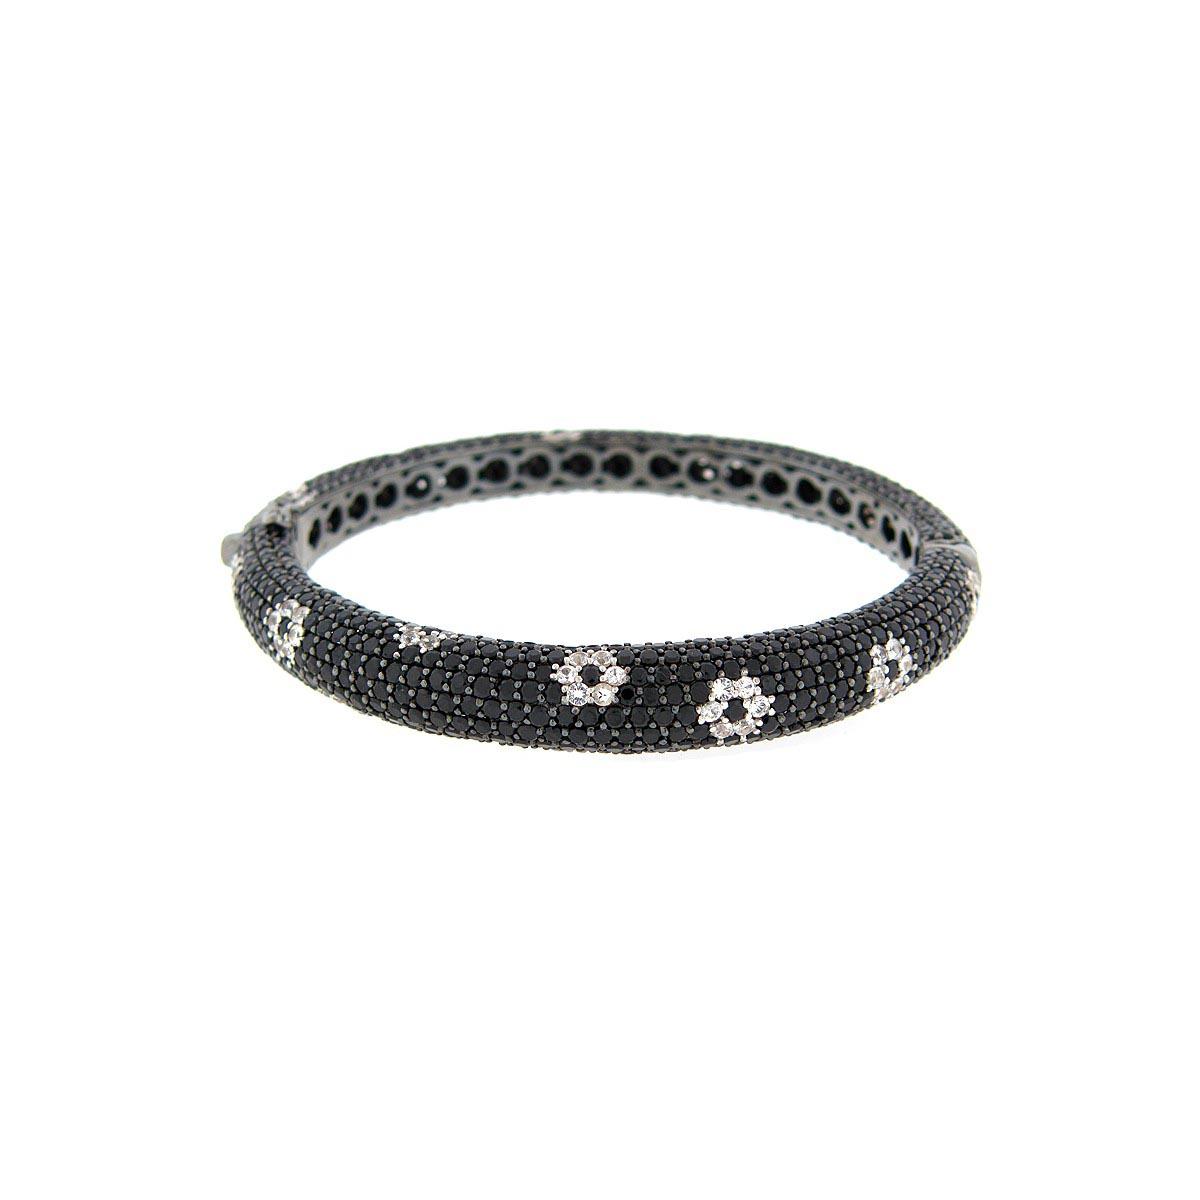 Black Spinel & White Sapphire Bangle